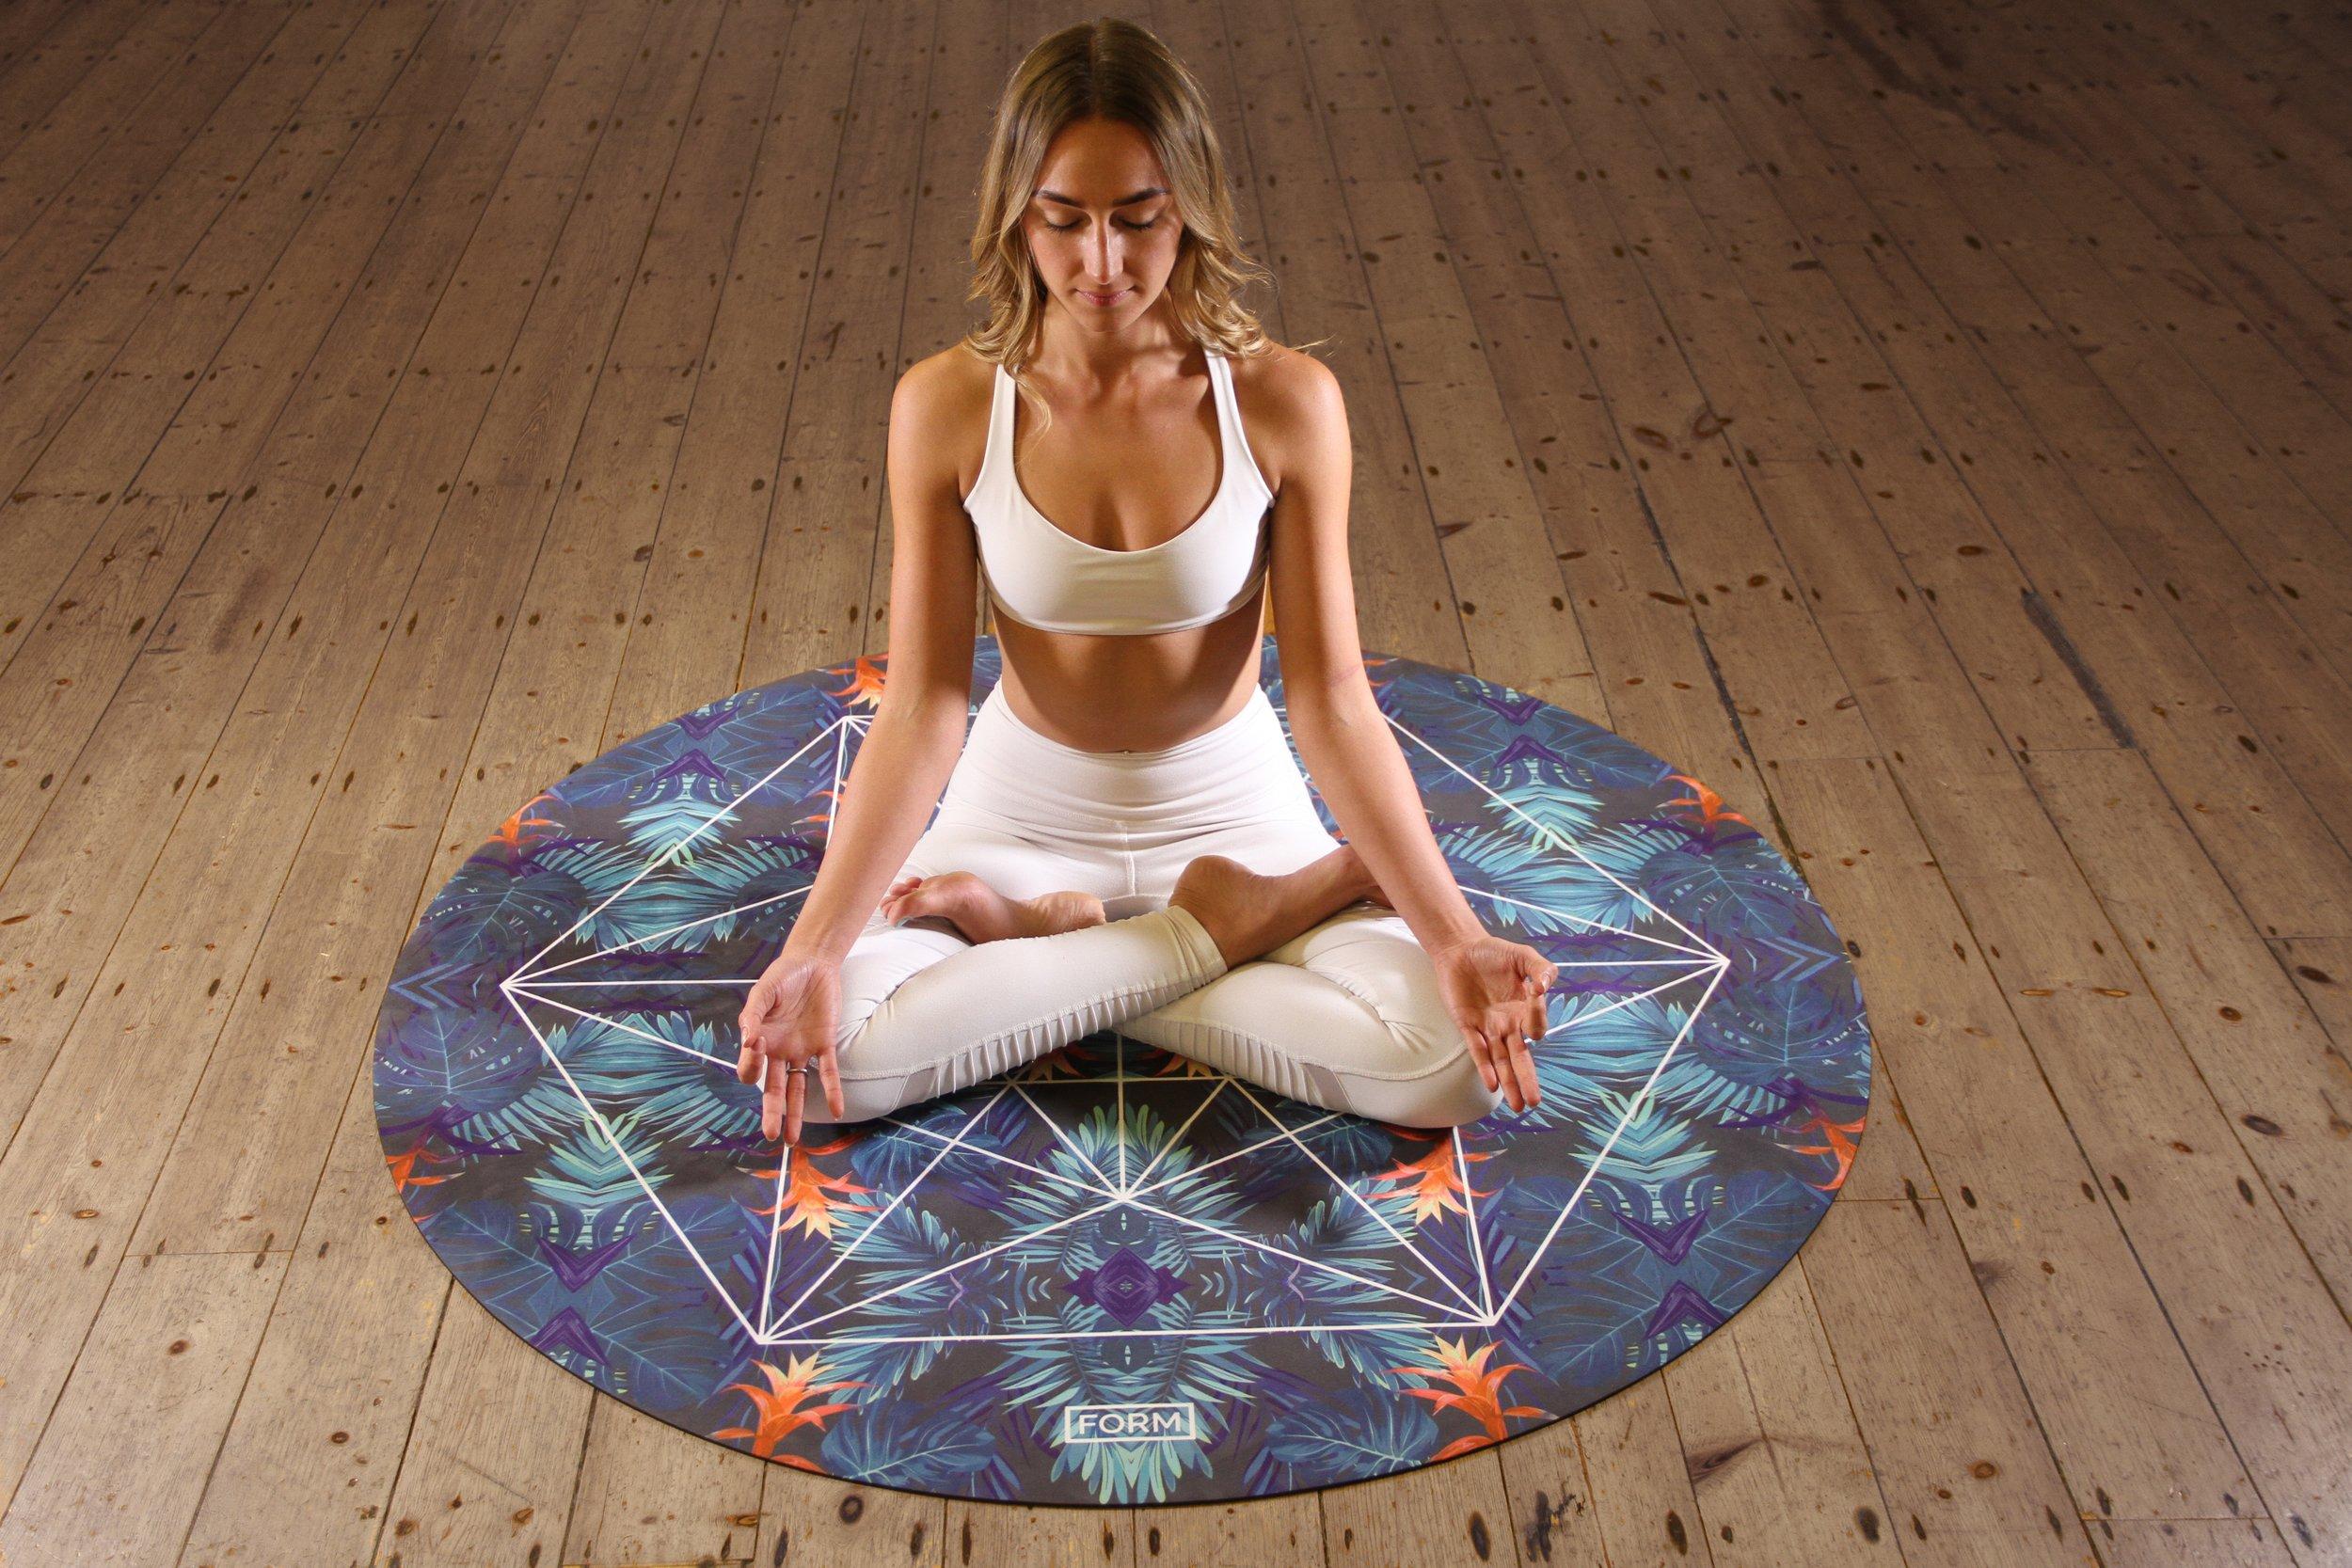 Practicing yoga can help sleep.